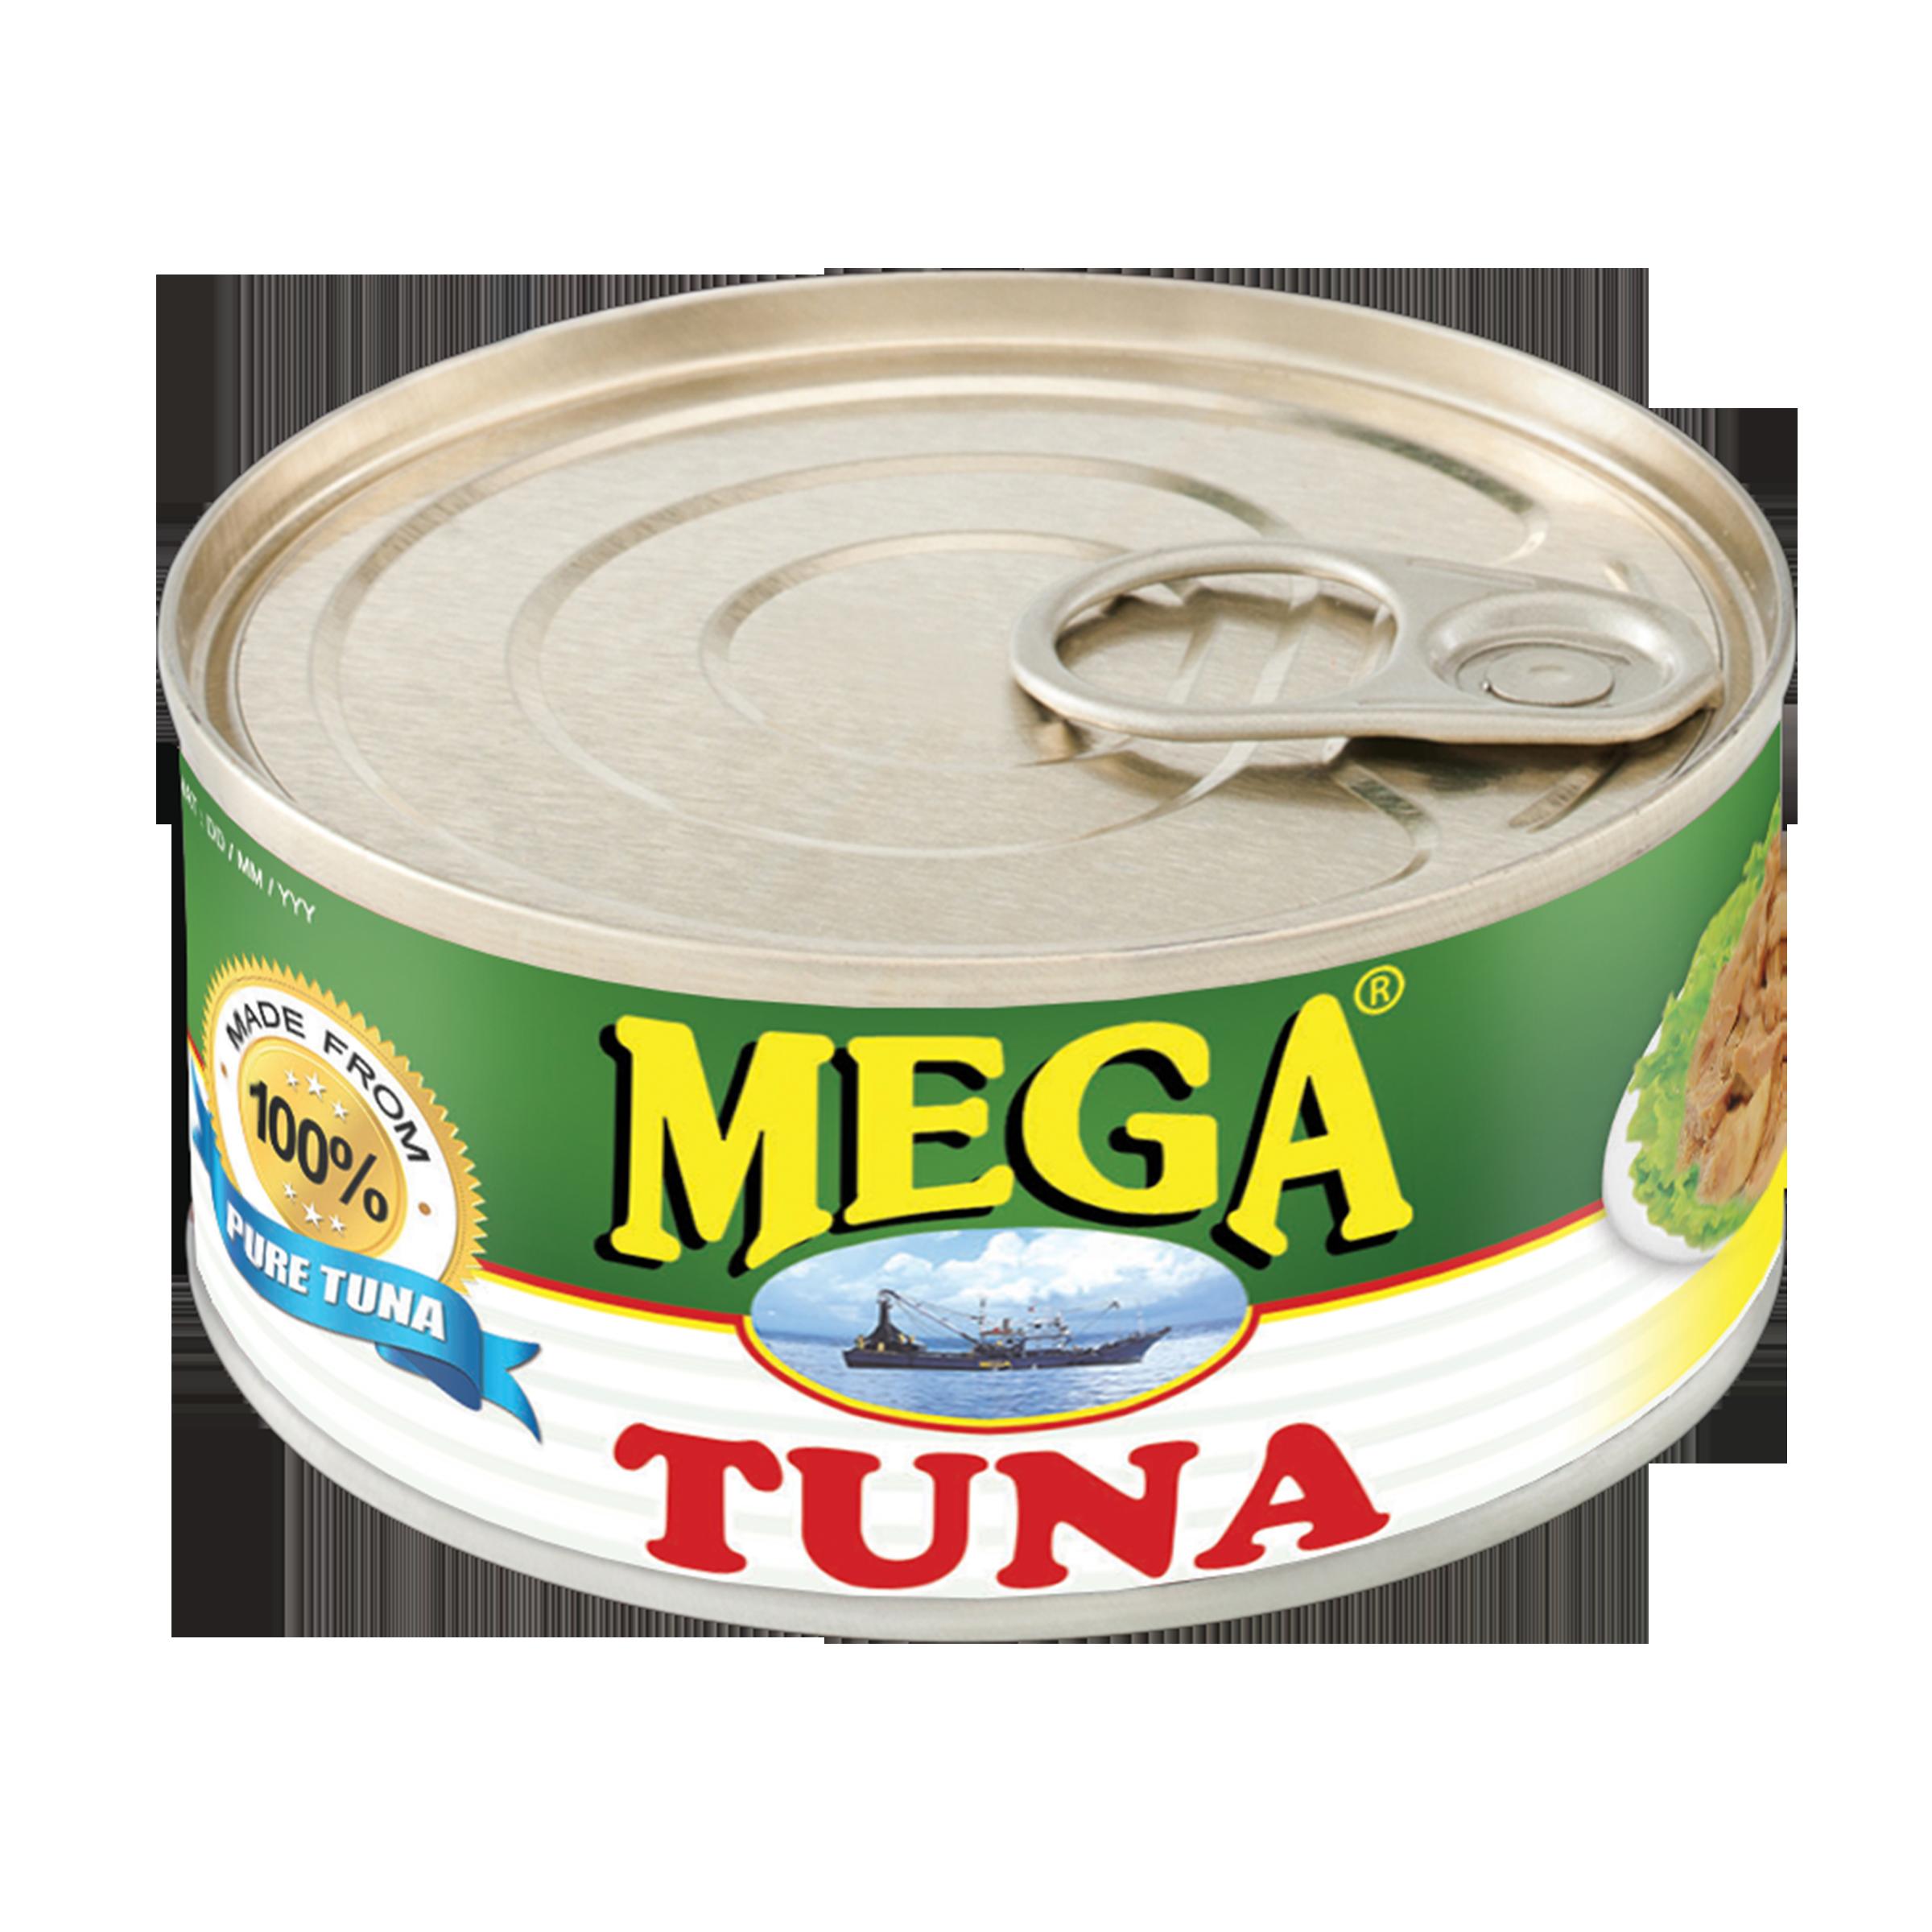 Tuna clipart mackerel fish. Mega flakes in oil